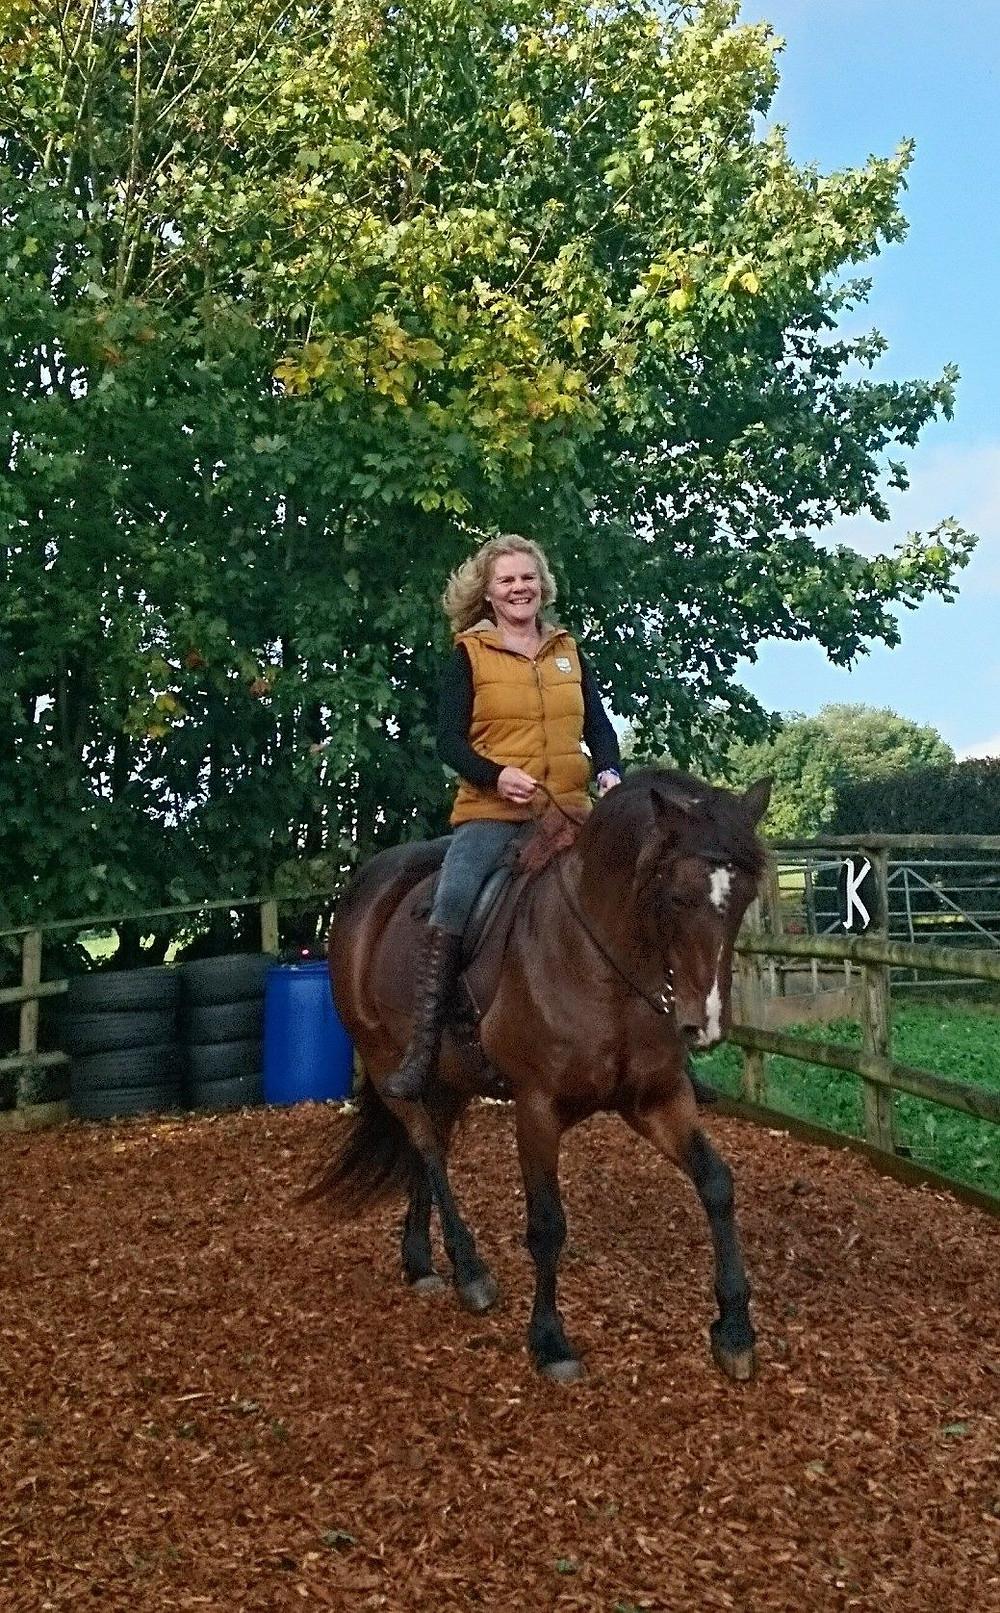 barefoot pony, treeless saddle, classical horsemanship, natural horsemanship, harmony, connection, Pippsway Wellington Somerset near Devon